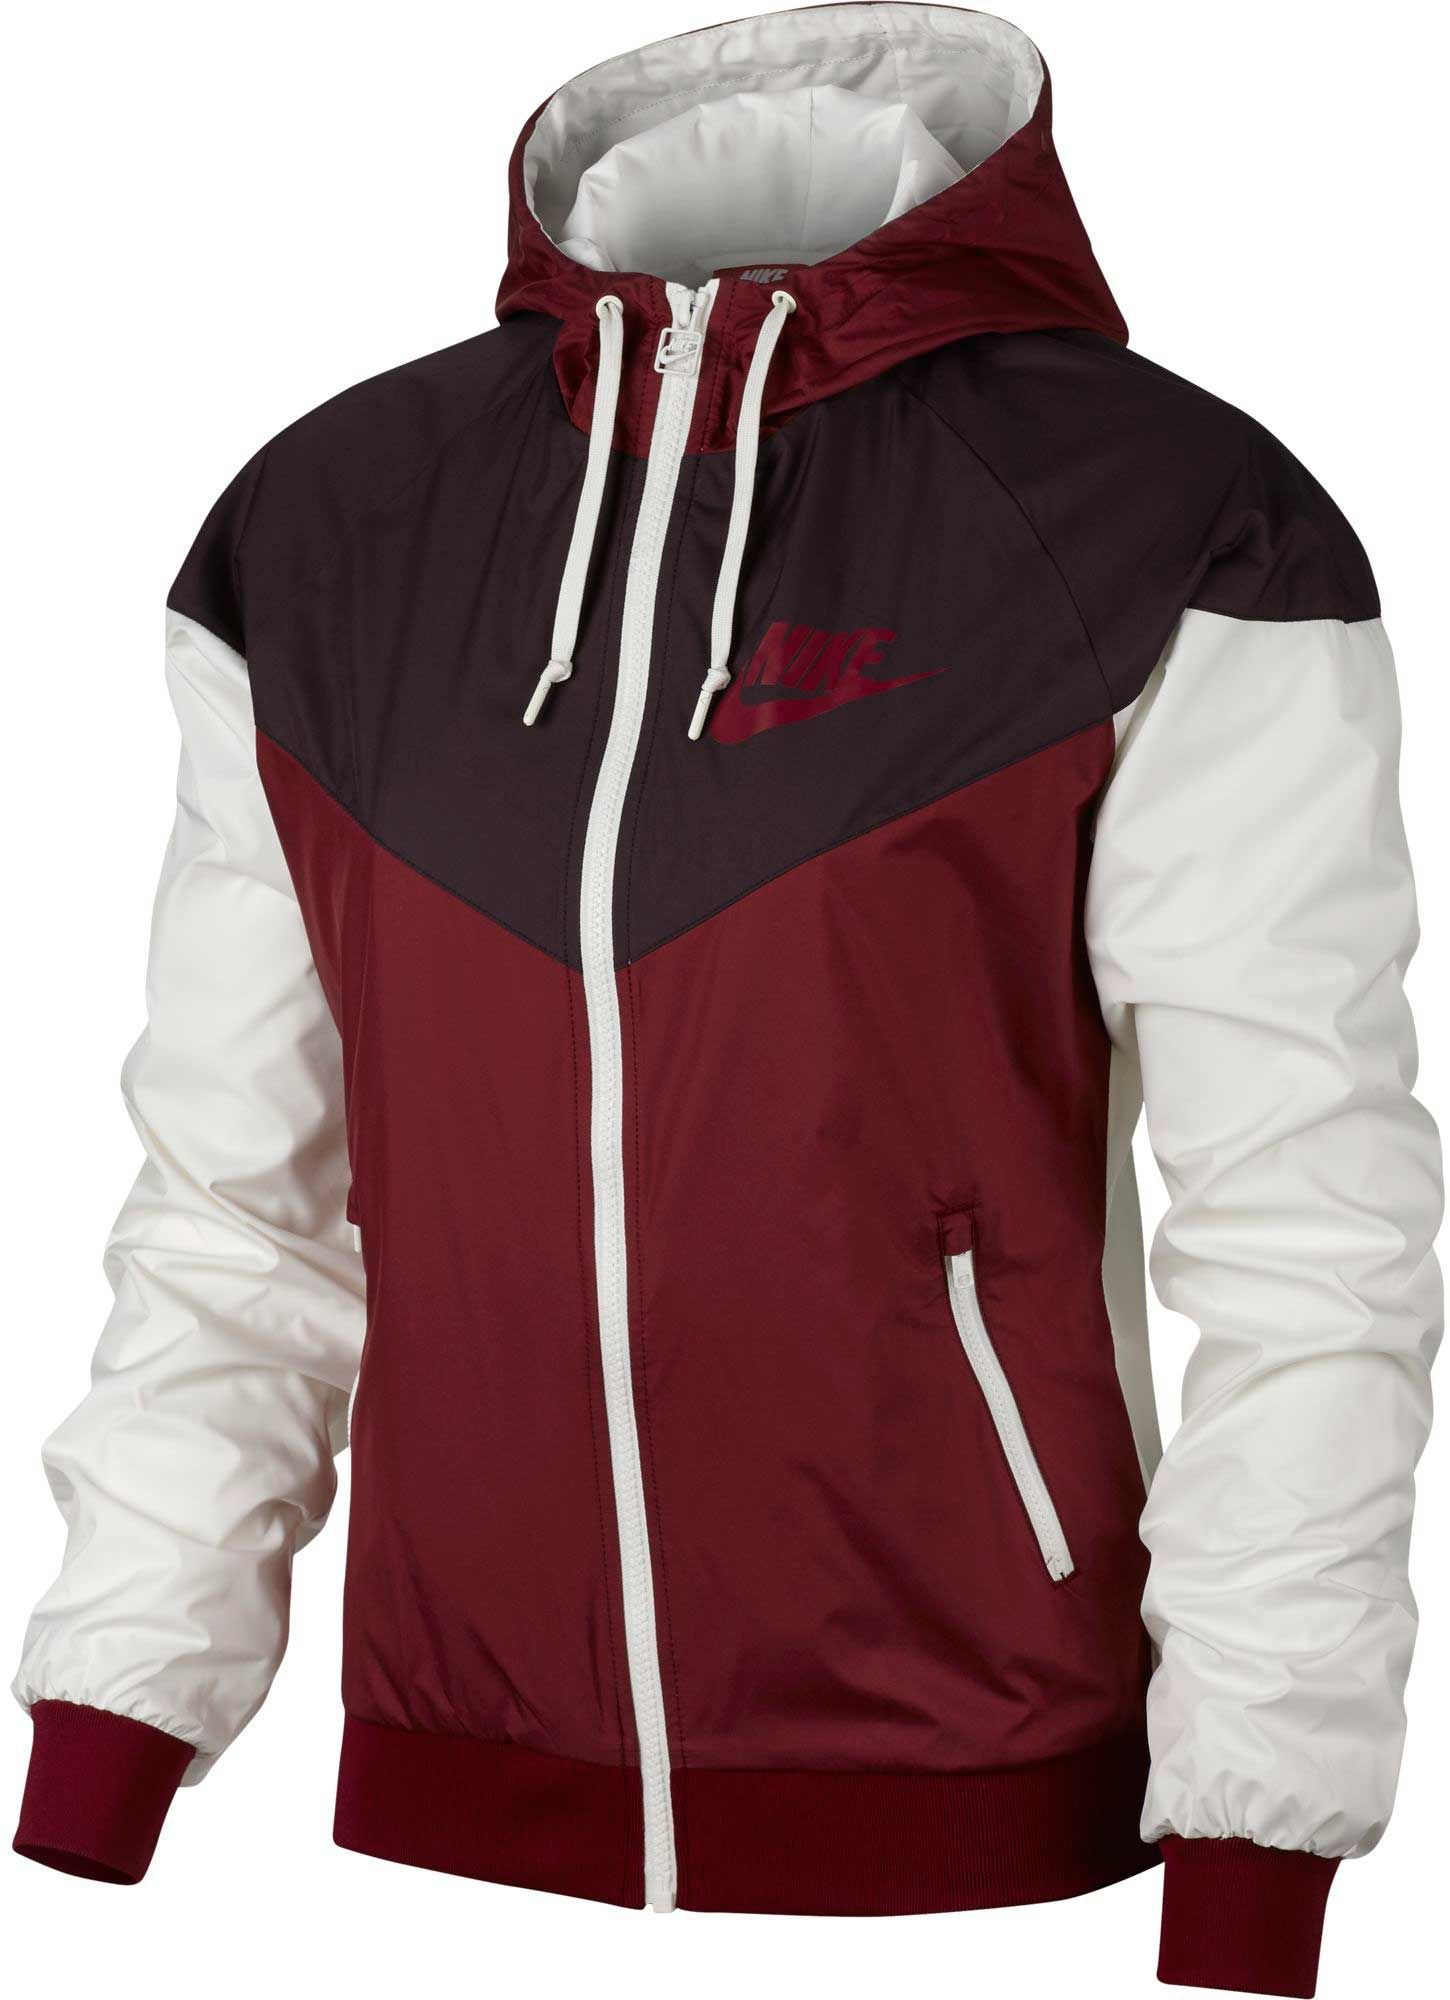 Nike Sportswear Windrunner Women's Jacket (Port Wine/Team Red, Medium)